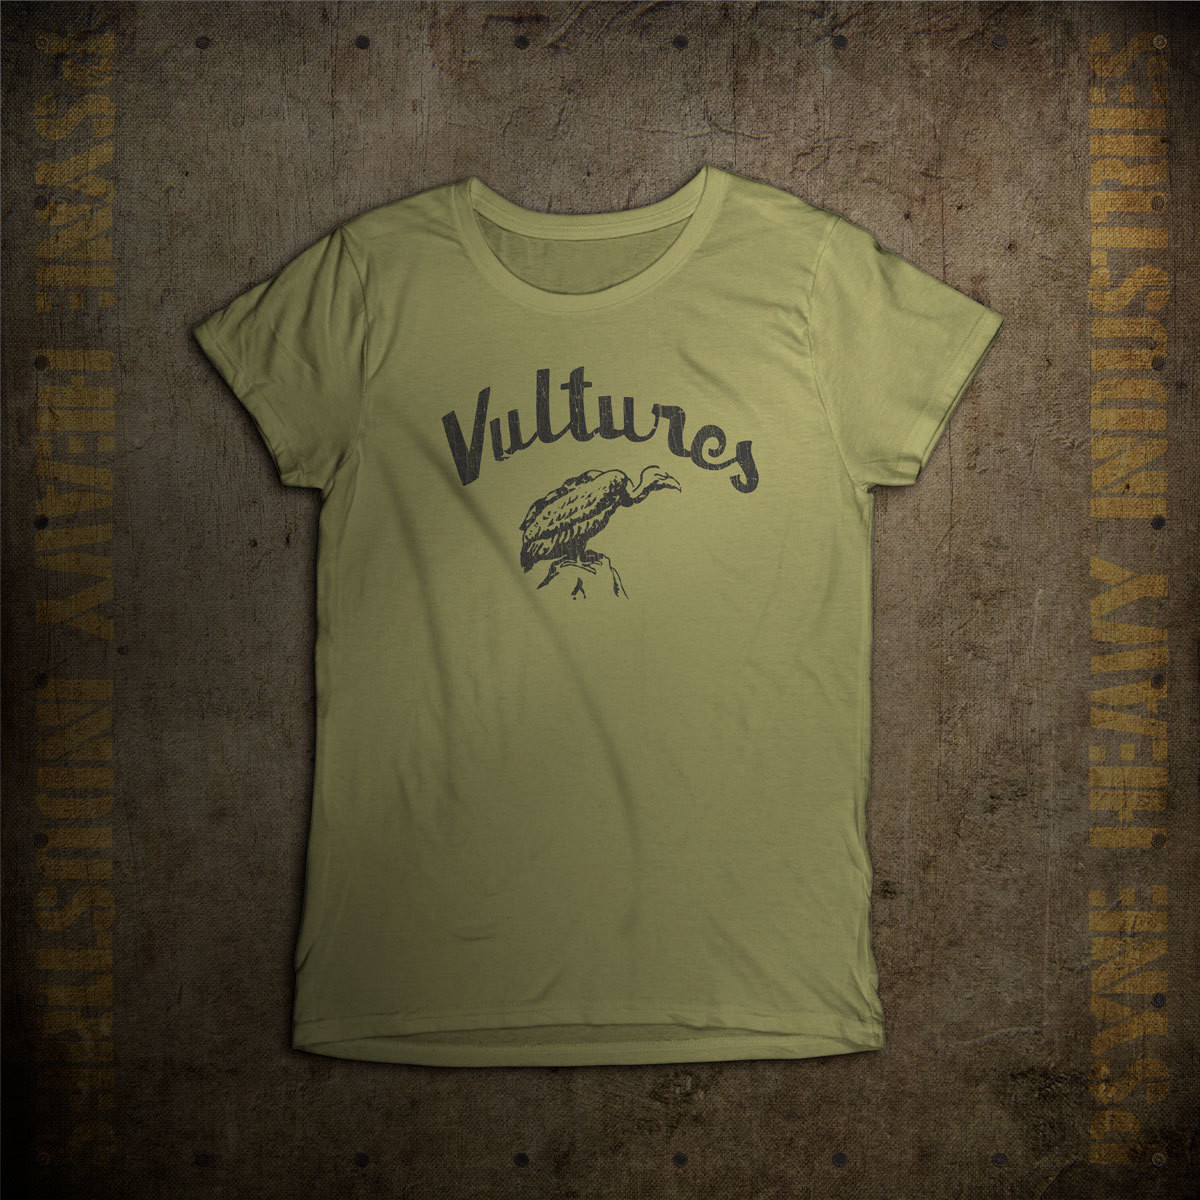 Vultures New York 1970s Vintage T-Shirt - Women's